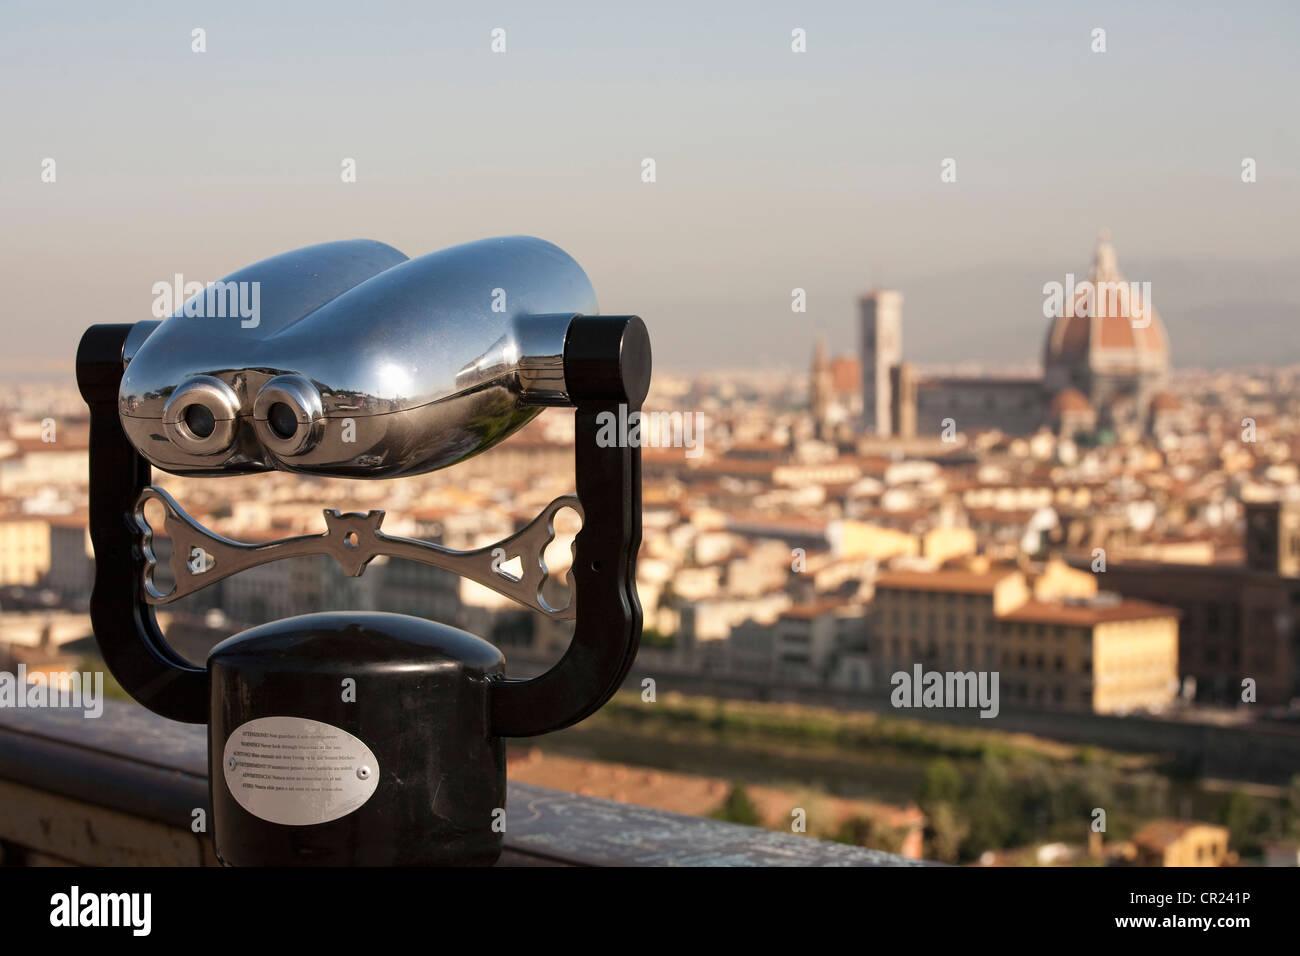 Binoculars overlooking cityscape - Stock Image